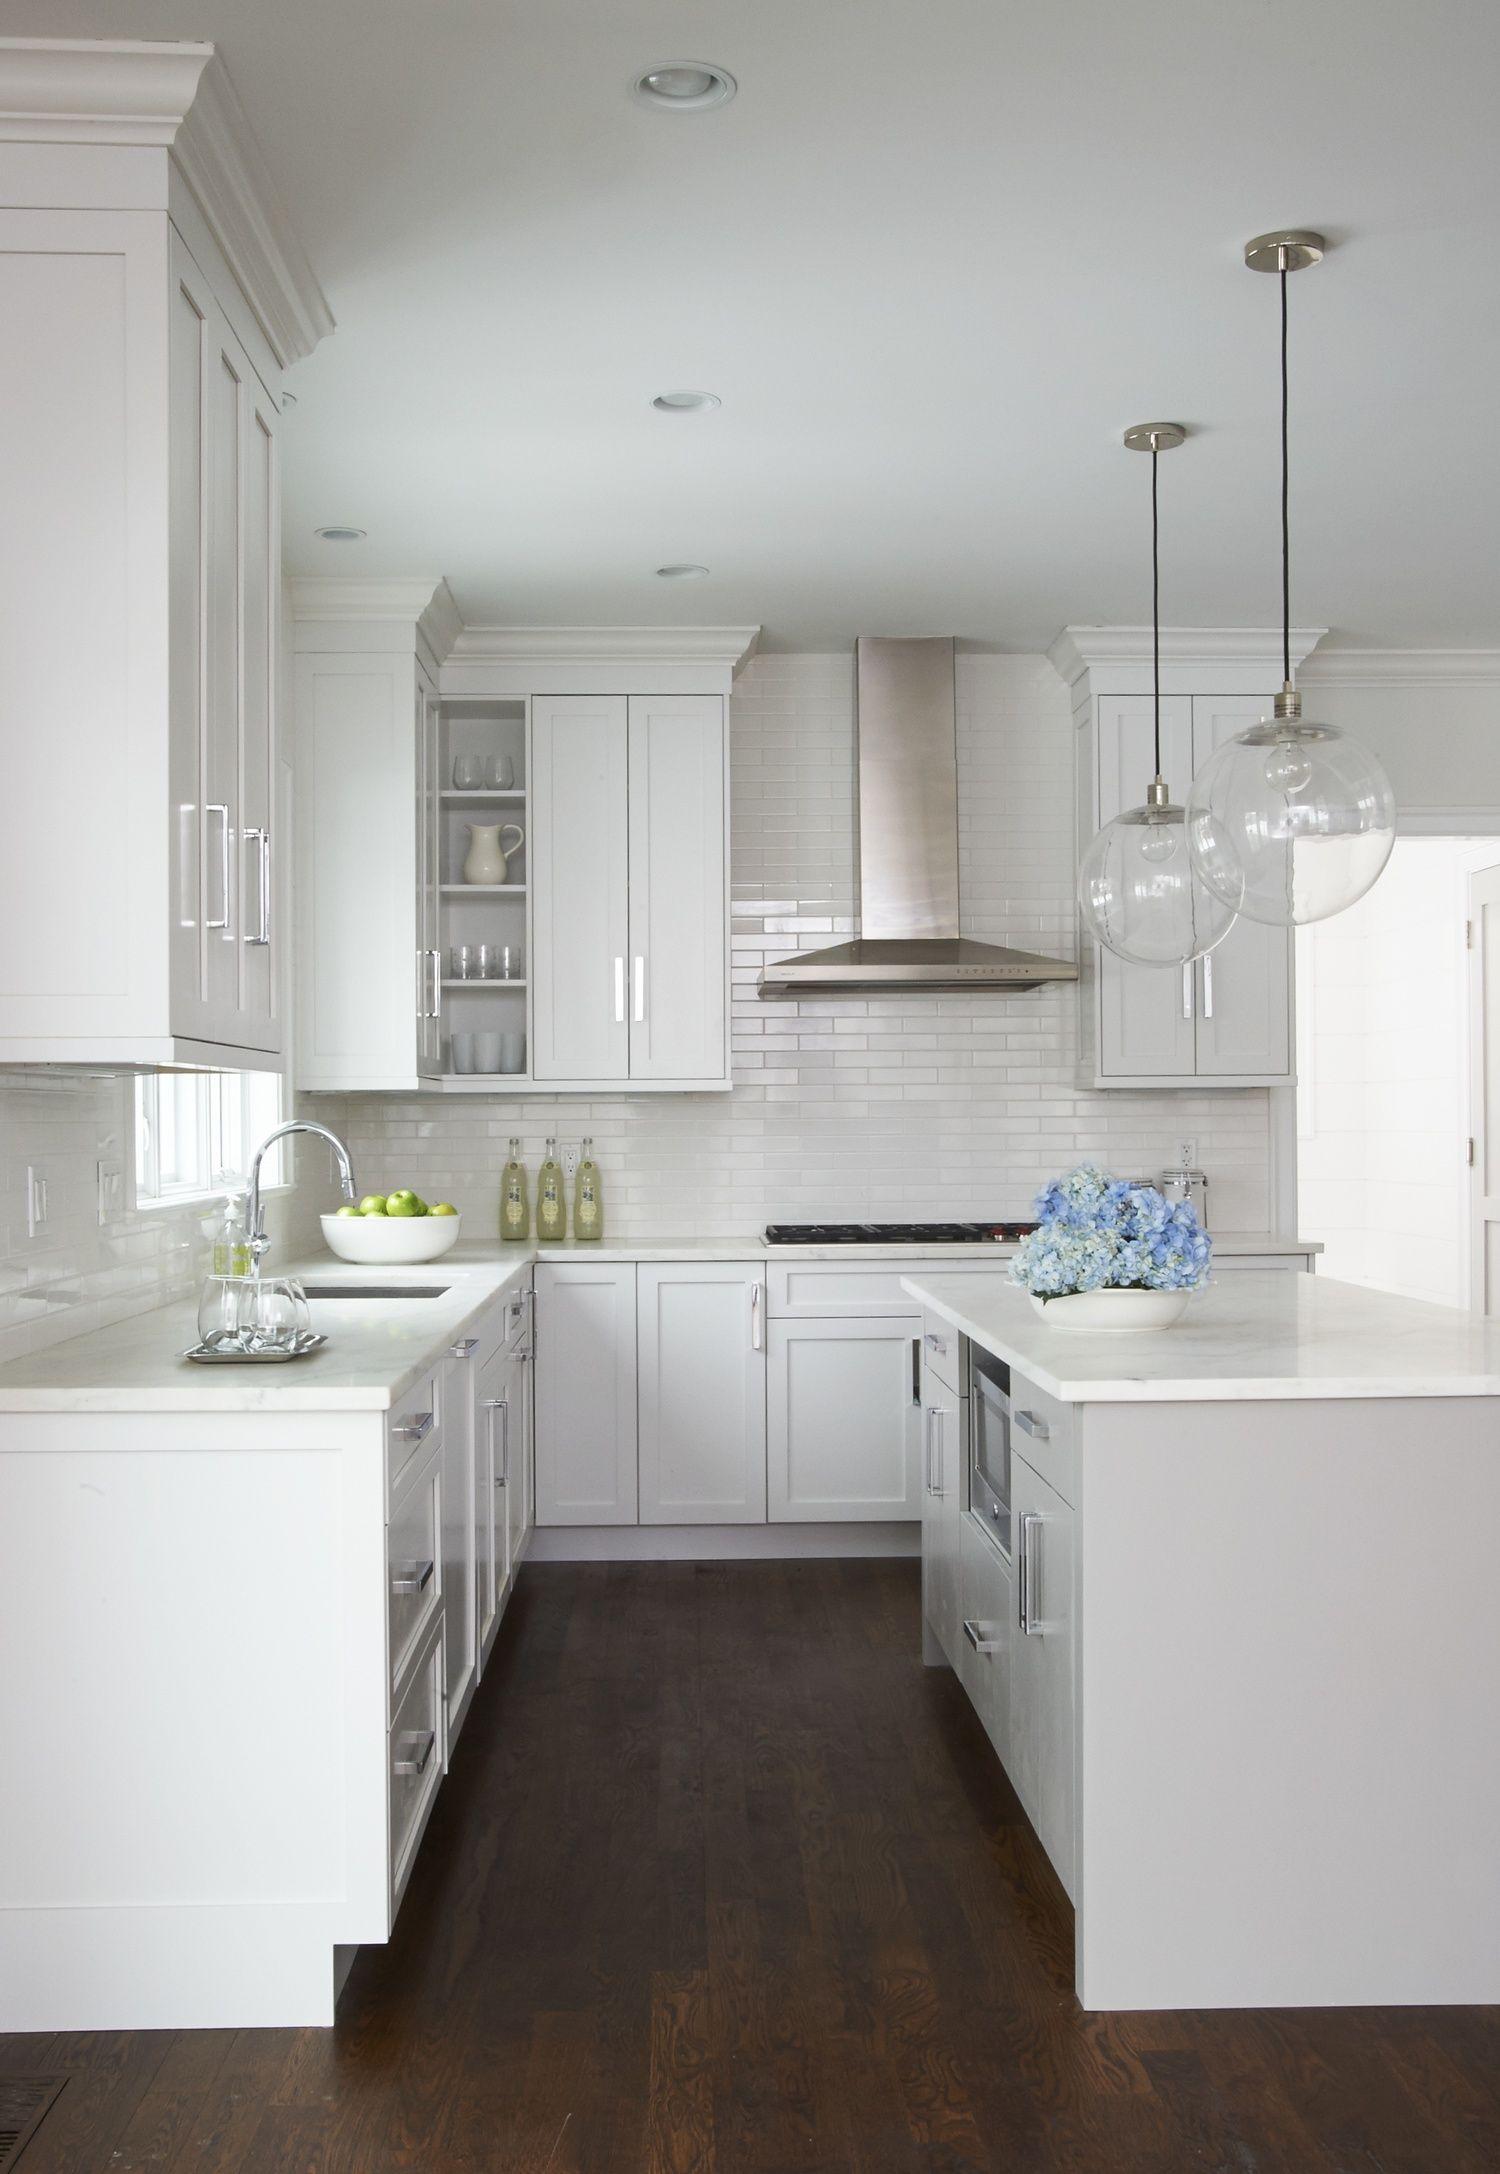 DEXTER KITCHEN 1.jpg | Home decor | Pinterest | Dexter, Kitchen ...